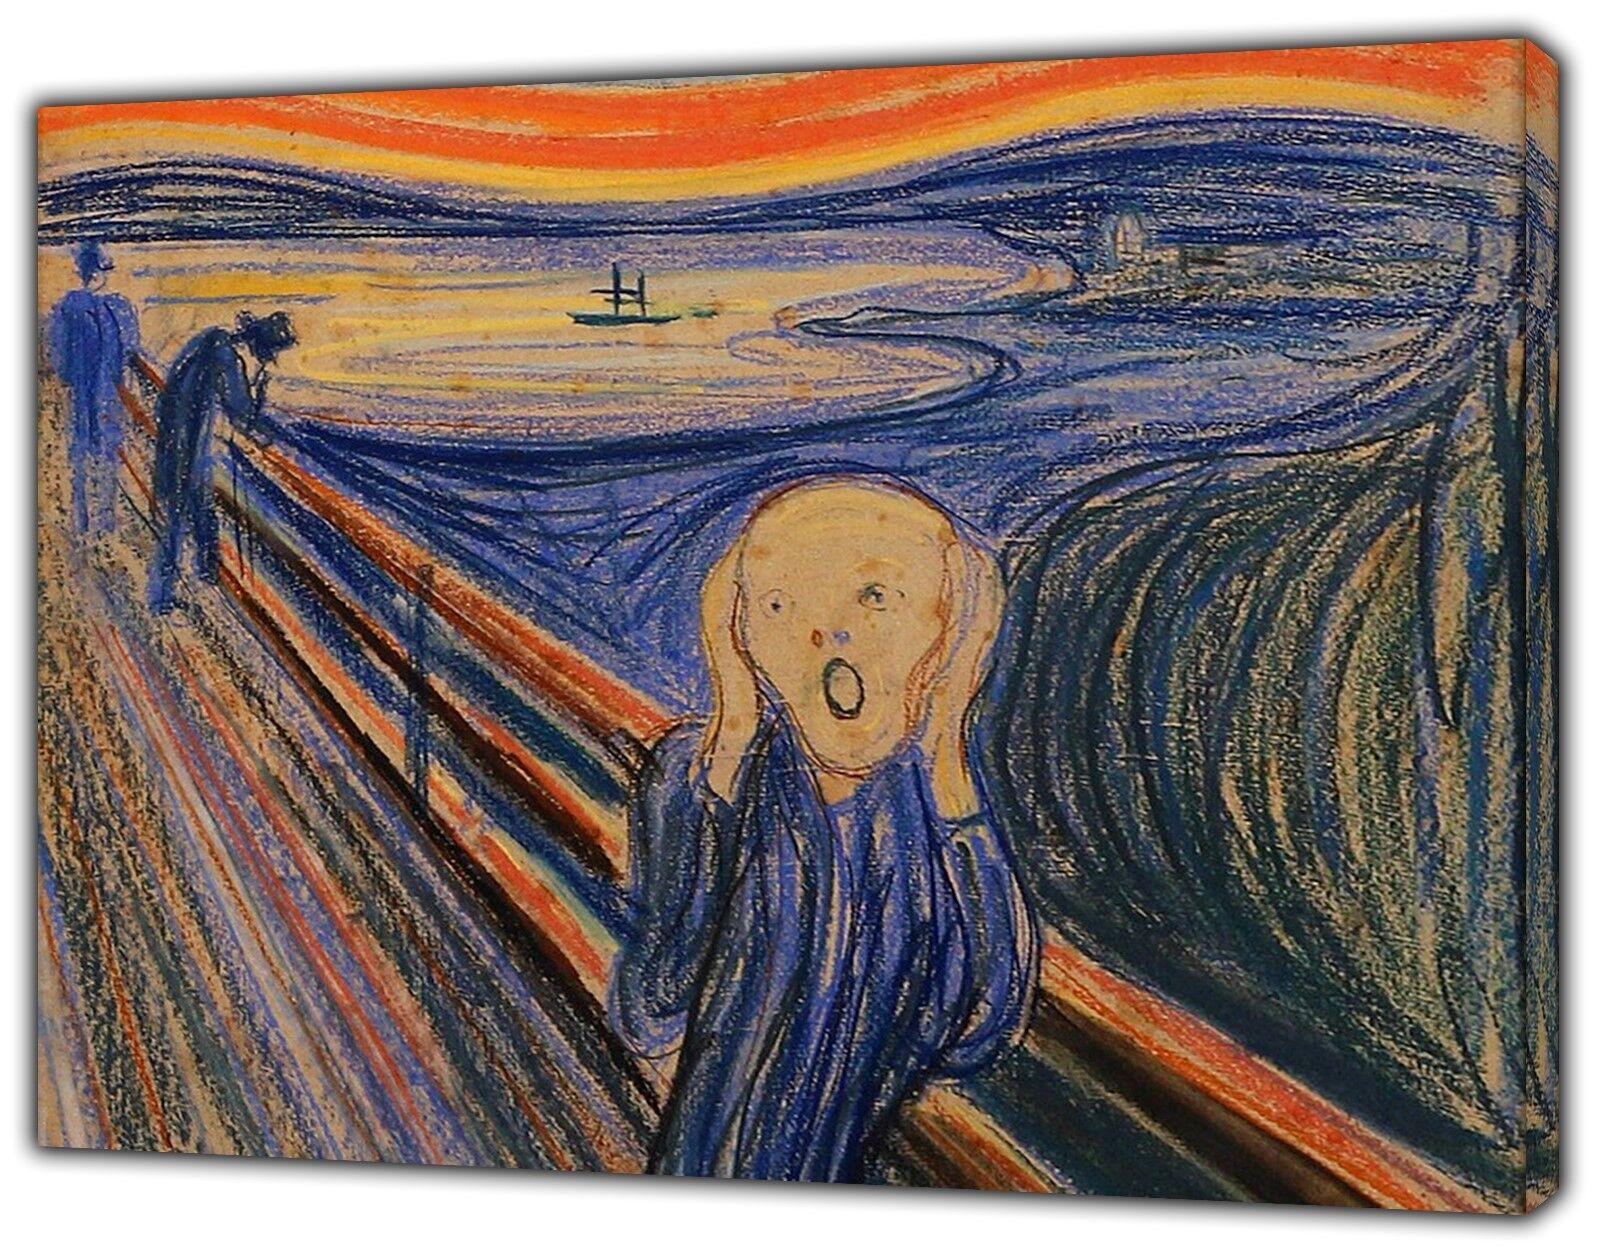 L'URLO Paint Blu di Edward Munch Stampa Su Tela Incorniciato Wall Art